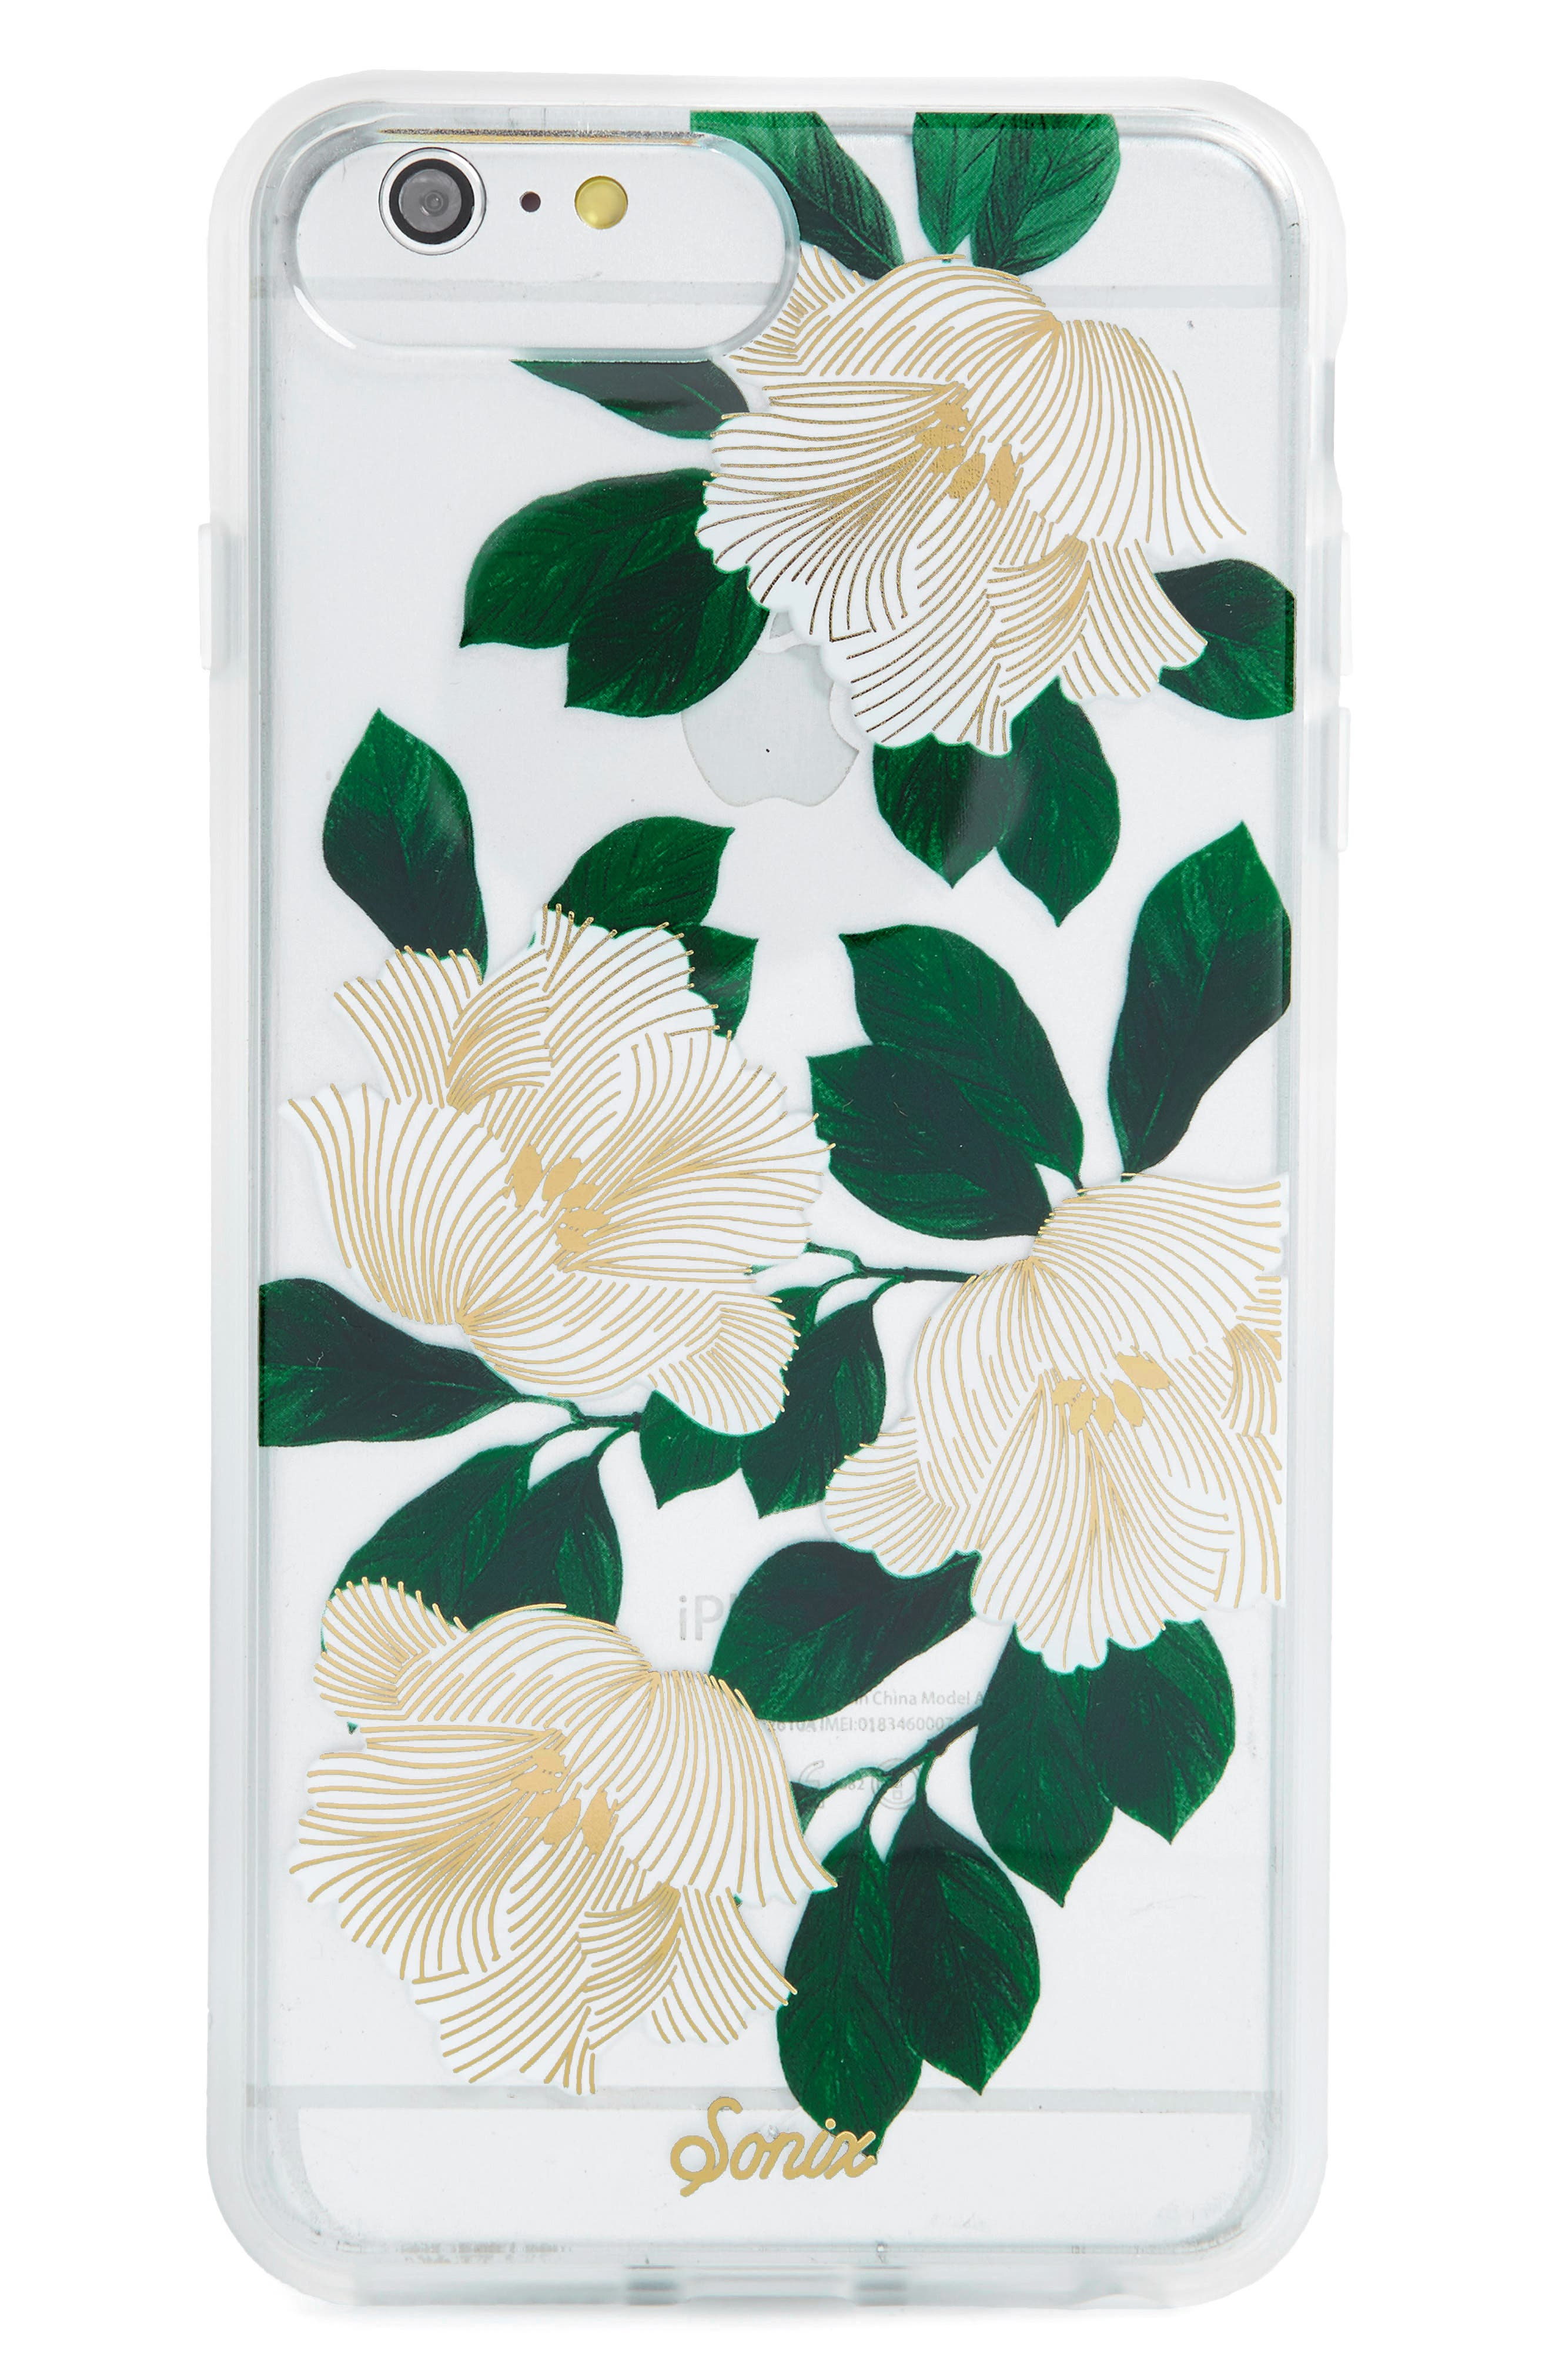 Alternate Image 1 Selected - Sonix Tropical Deco iPhone 6/6s/7/8 & 6/6s/7/8 Plus Case